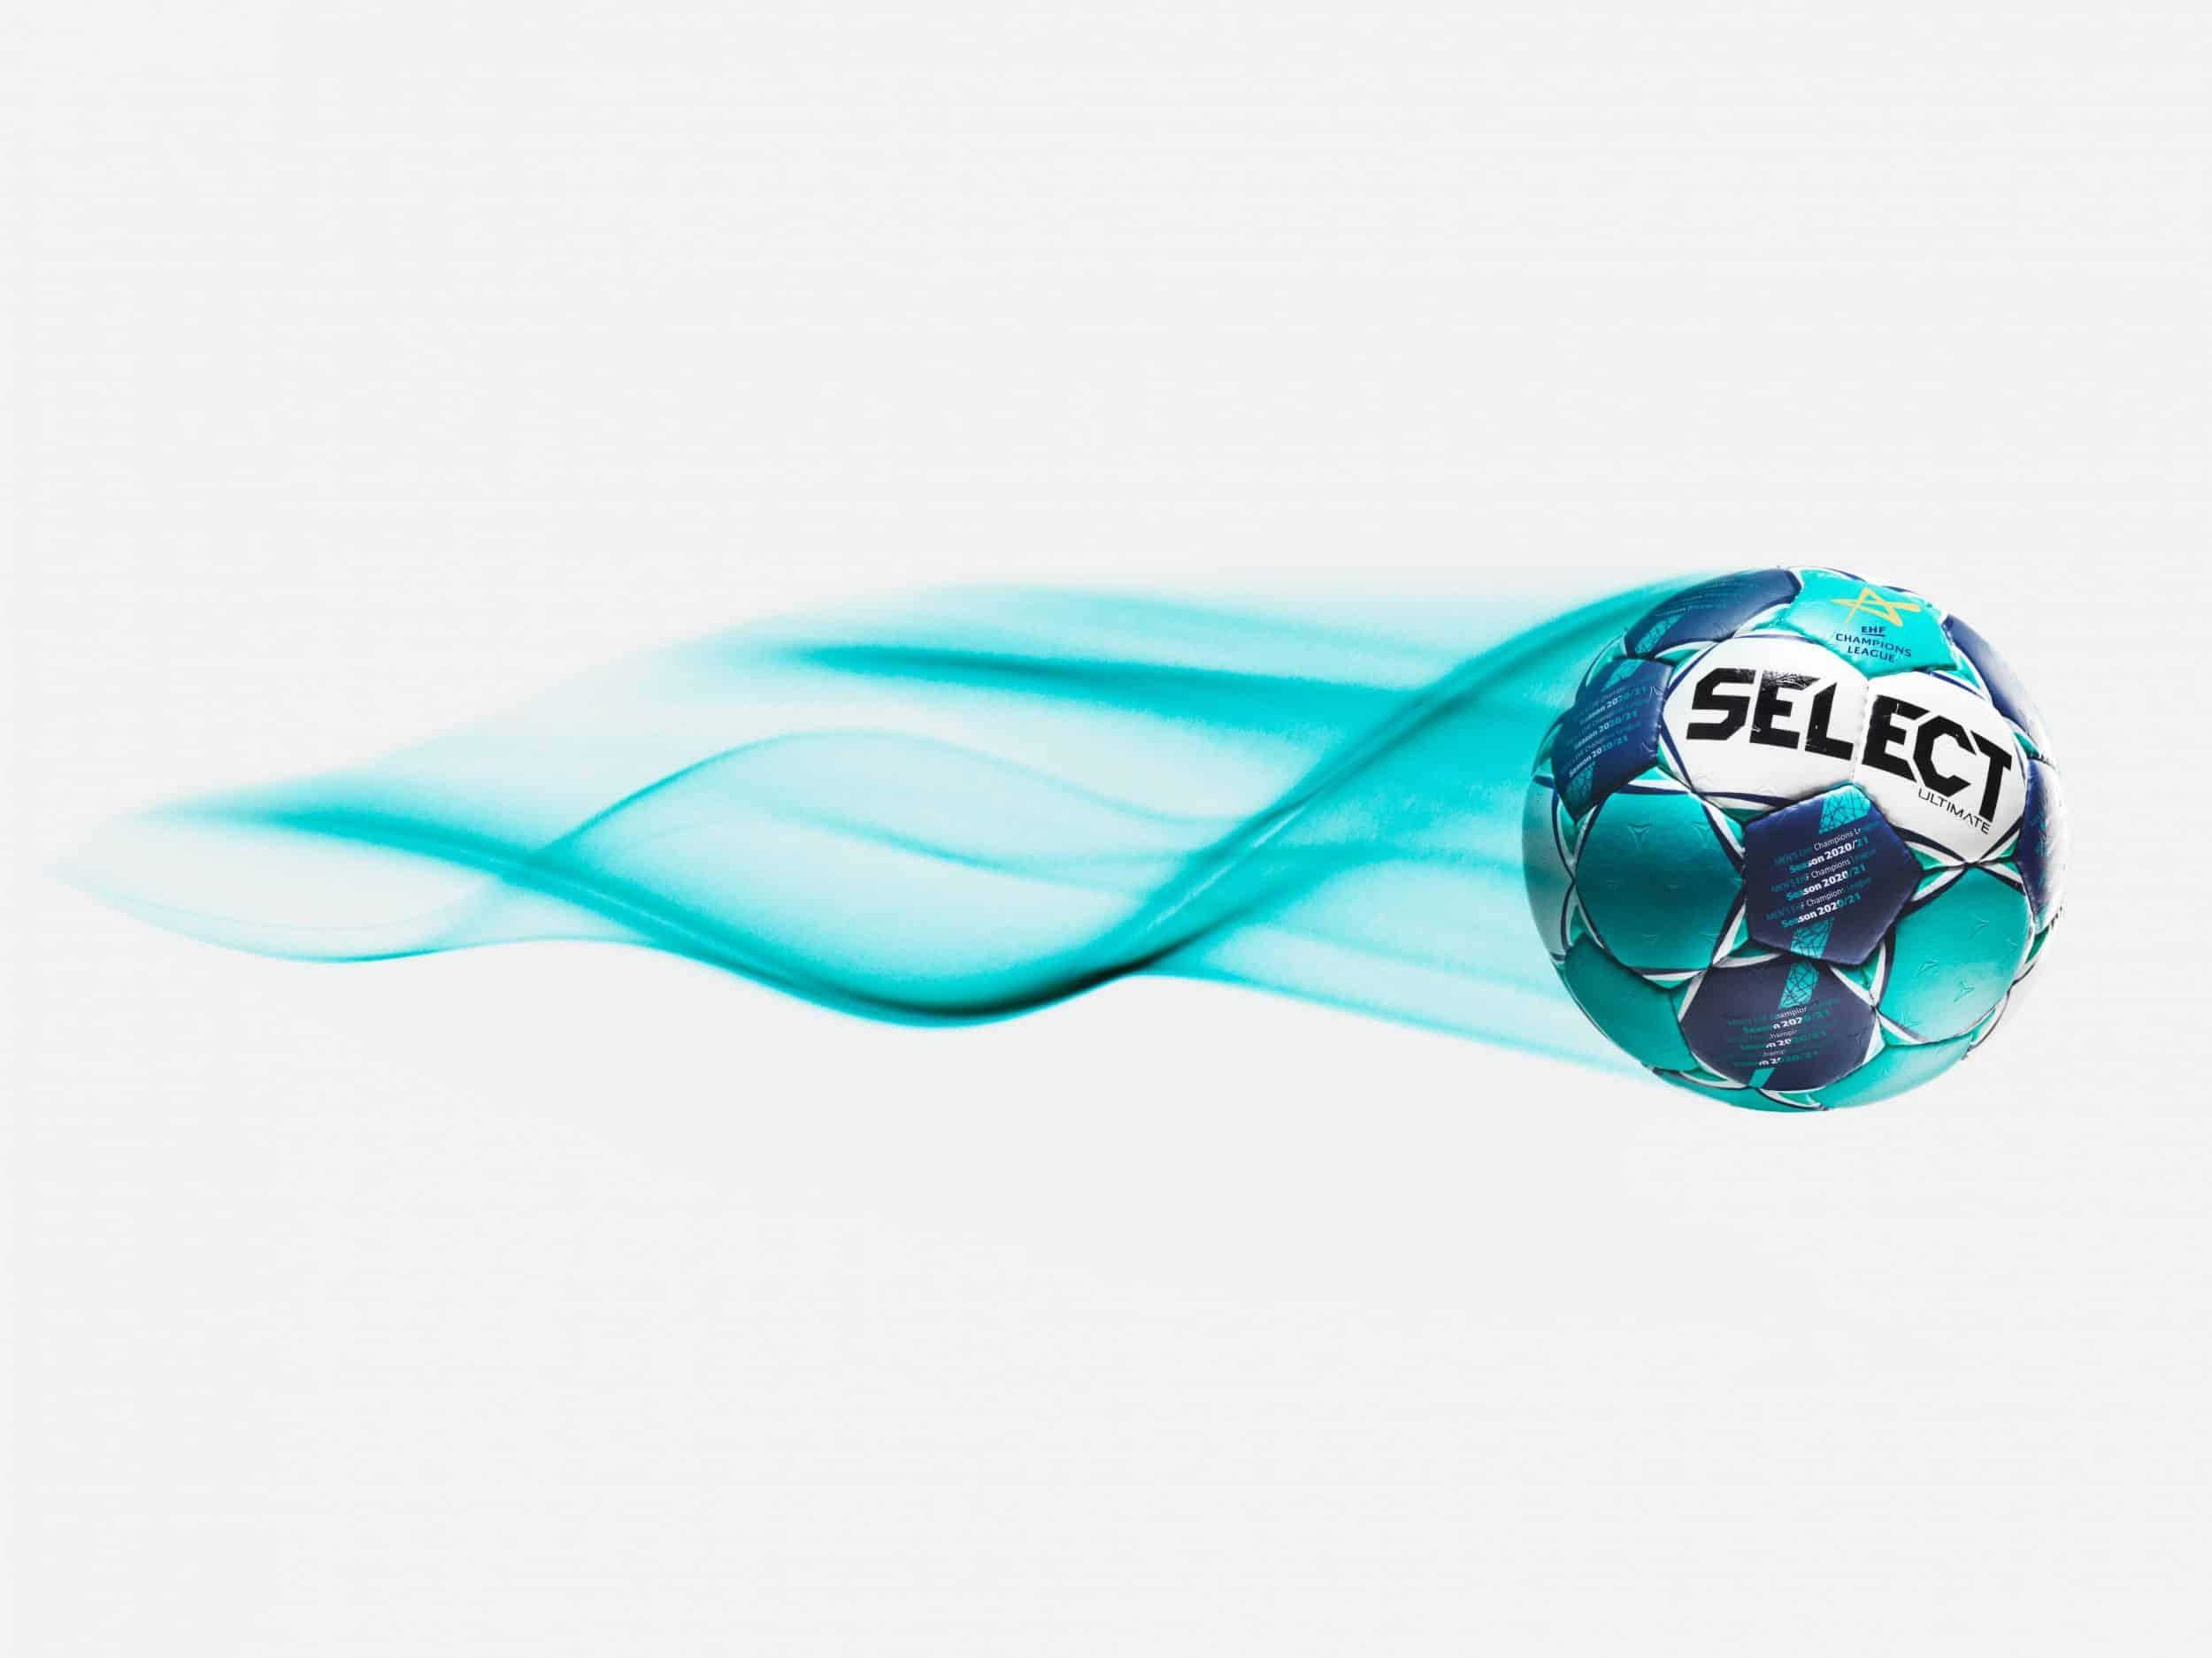 ballon-hand-select-ultimate-EHF-champions-league-2020-2021-2